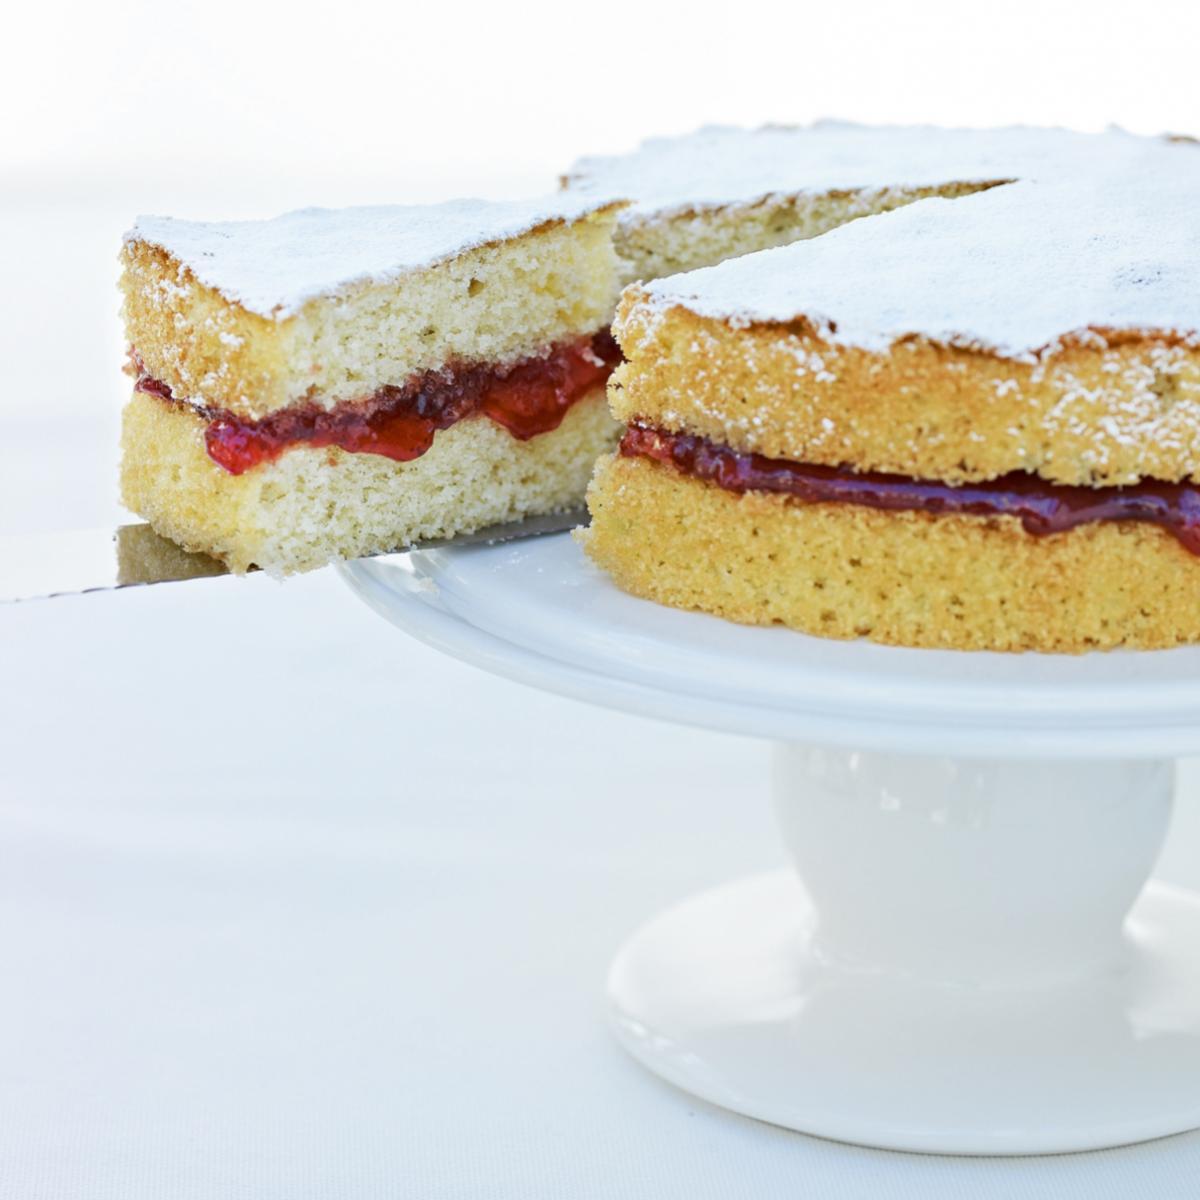 Delia chocolate sponge cake recipe